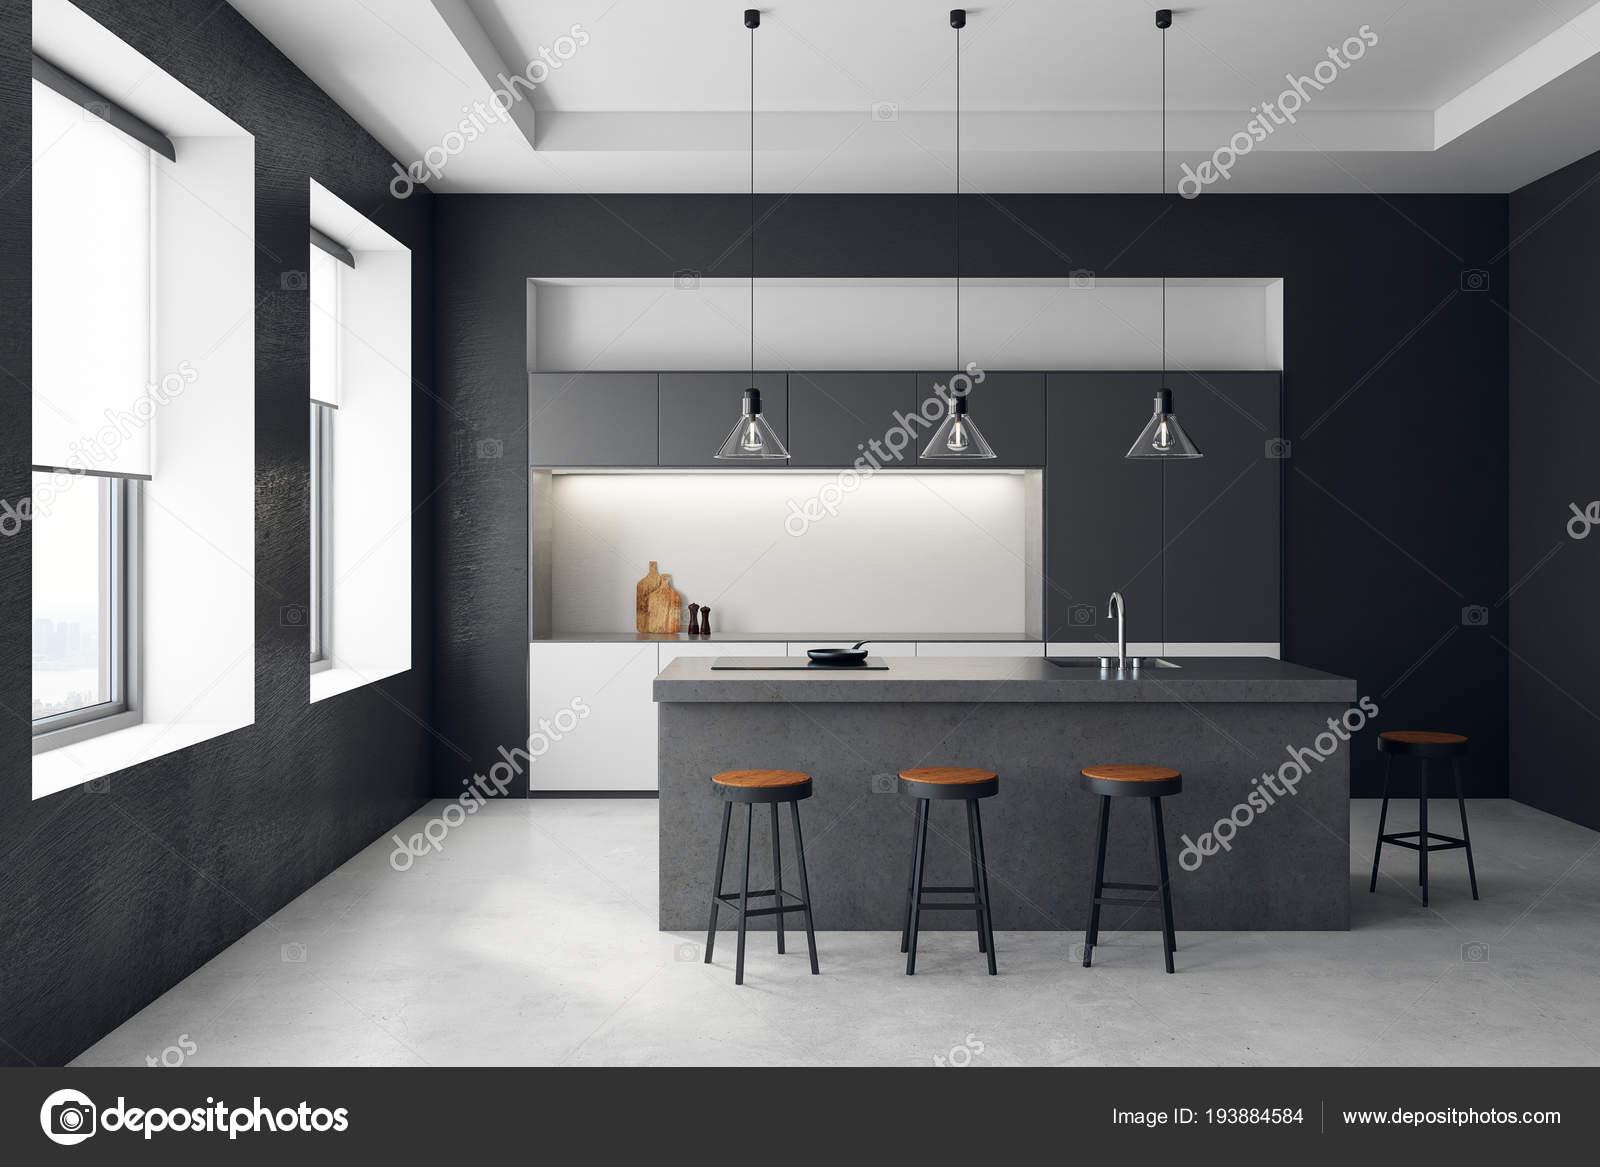 Moderne dunkle Küche Interieur — Stockfoto © peshkova #193884584